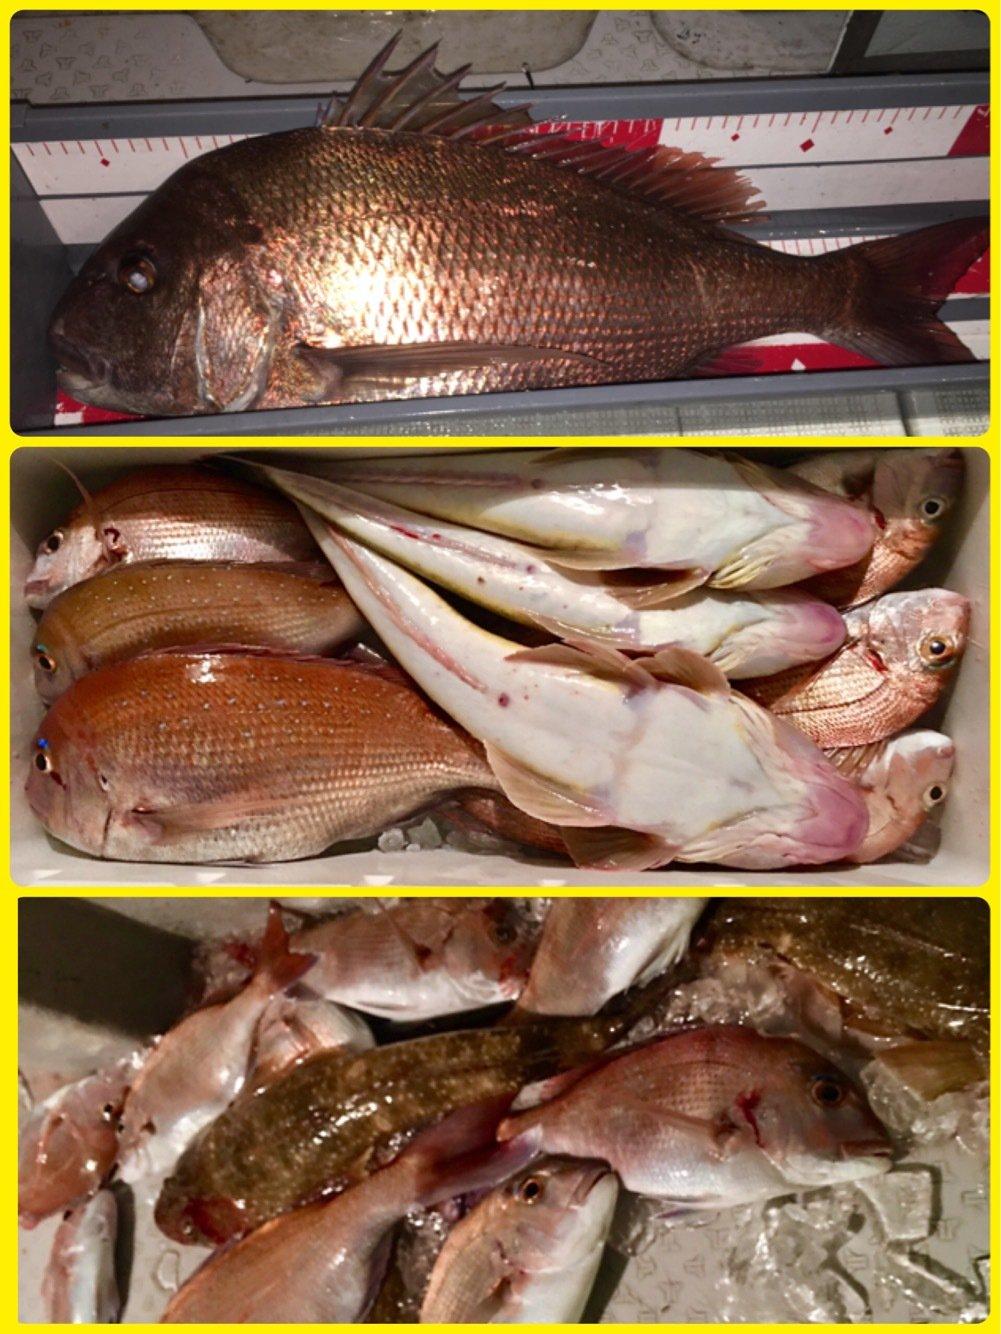 kiyosakuさんの投稿画像,写っている魚はマダイ